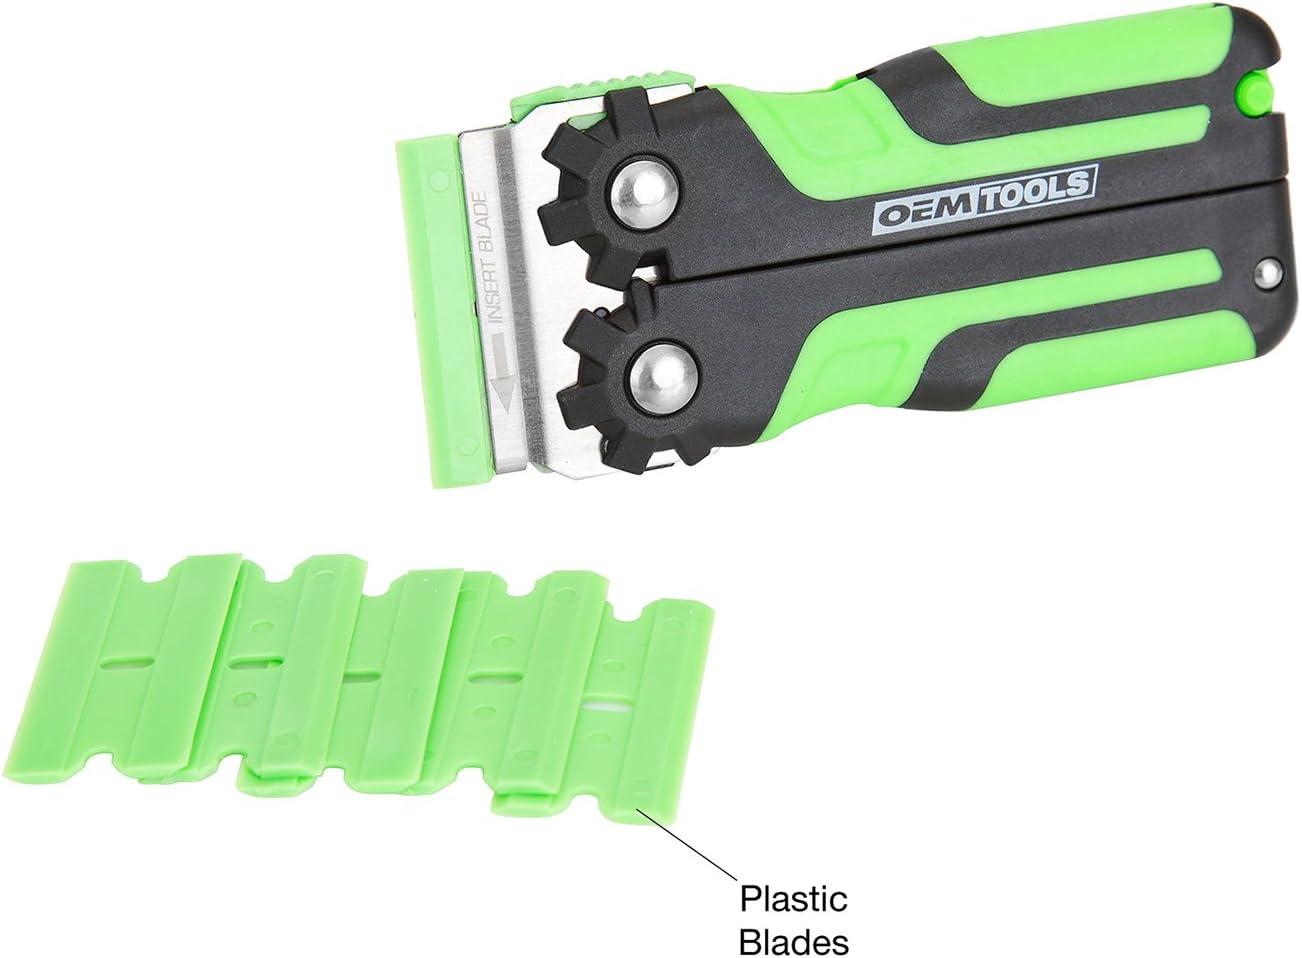 Carbon Scraper OEM Tools 25500 Razor Blade Gasket